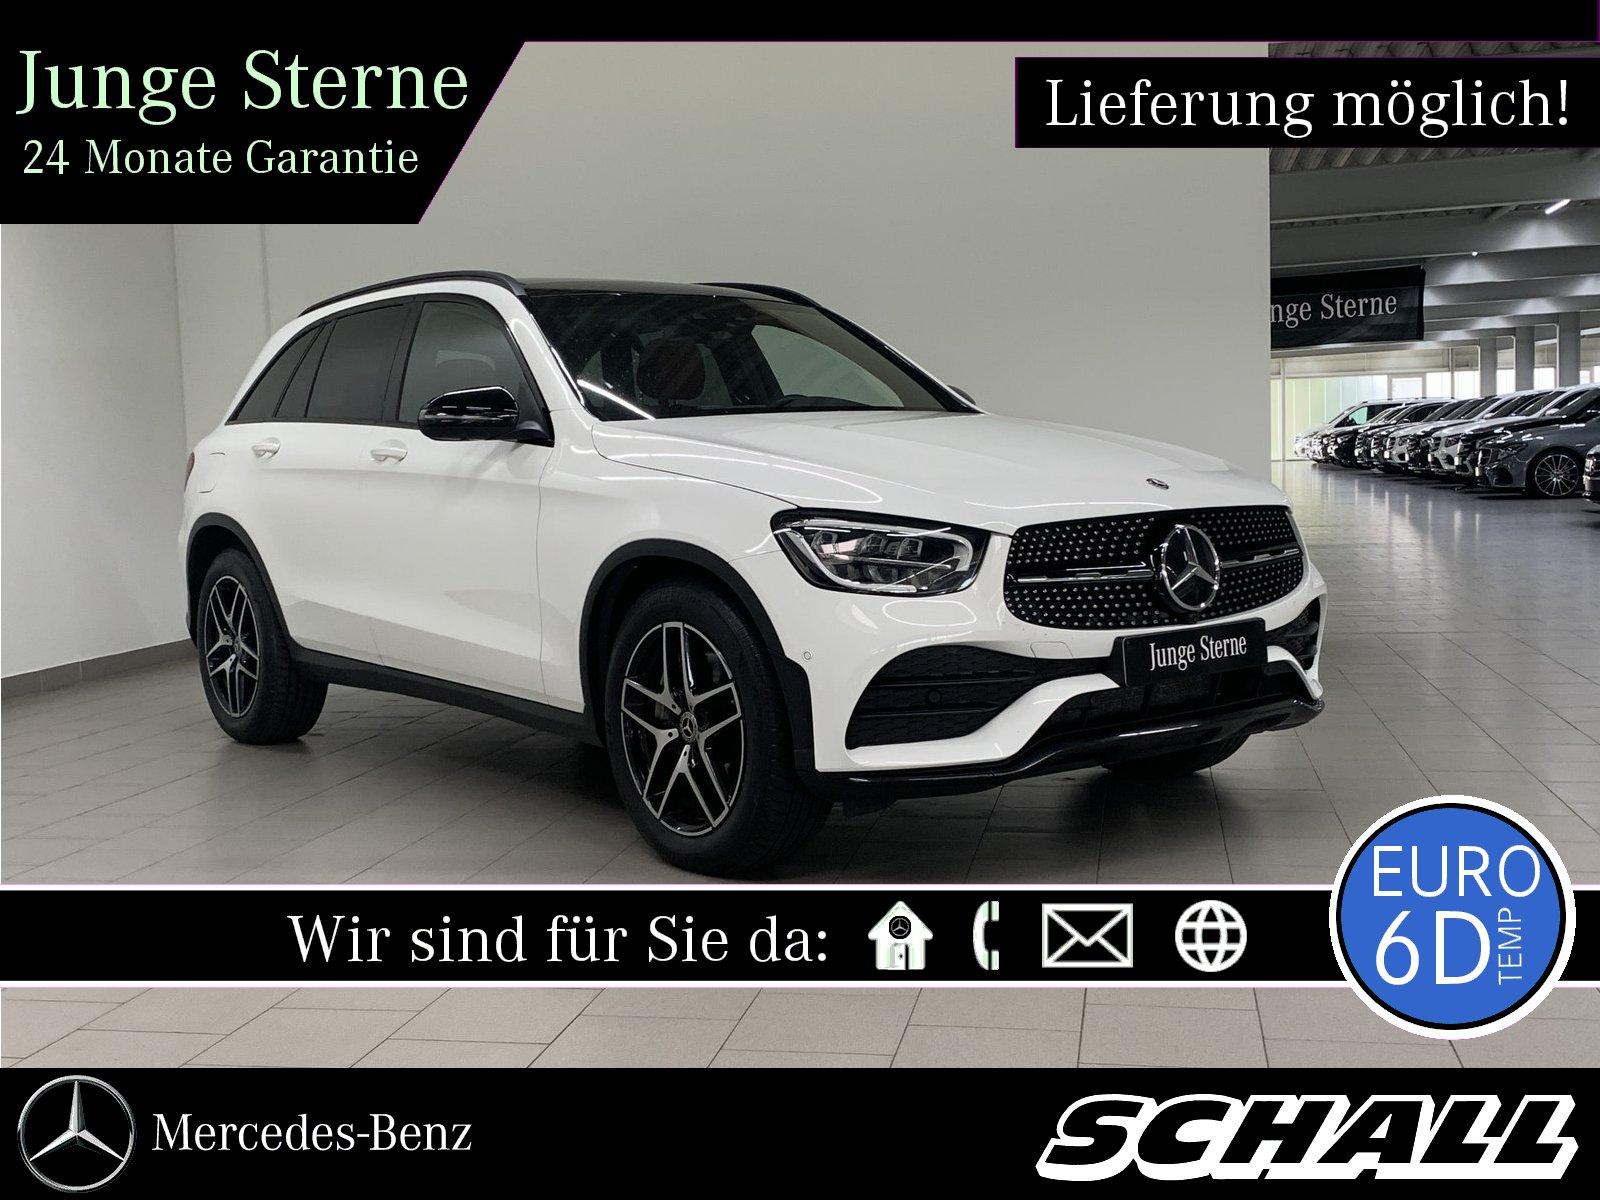 Mercedes-Benz GLC 400 d 4M AMG+NIGHT+PANO+LED+NAVI+360°+TOTWIN, Jahr 2019, Diesel